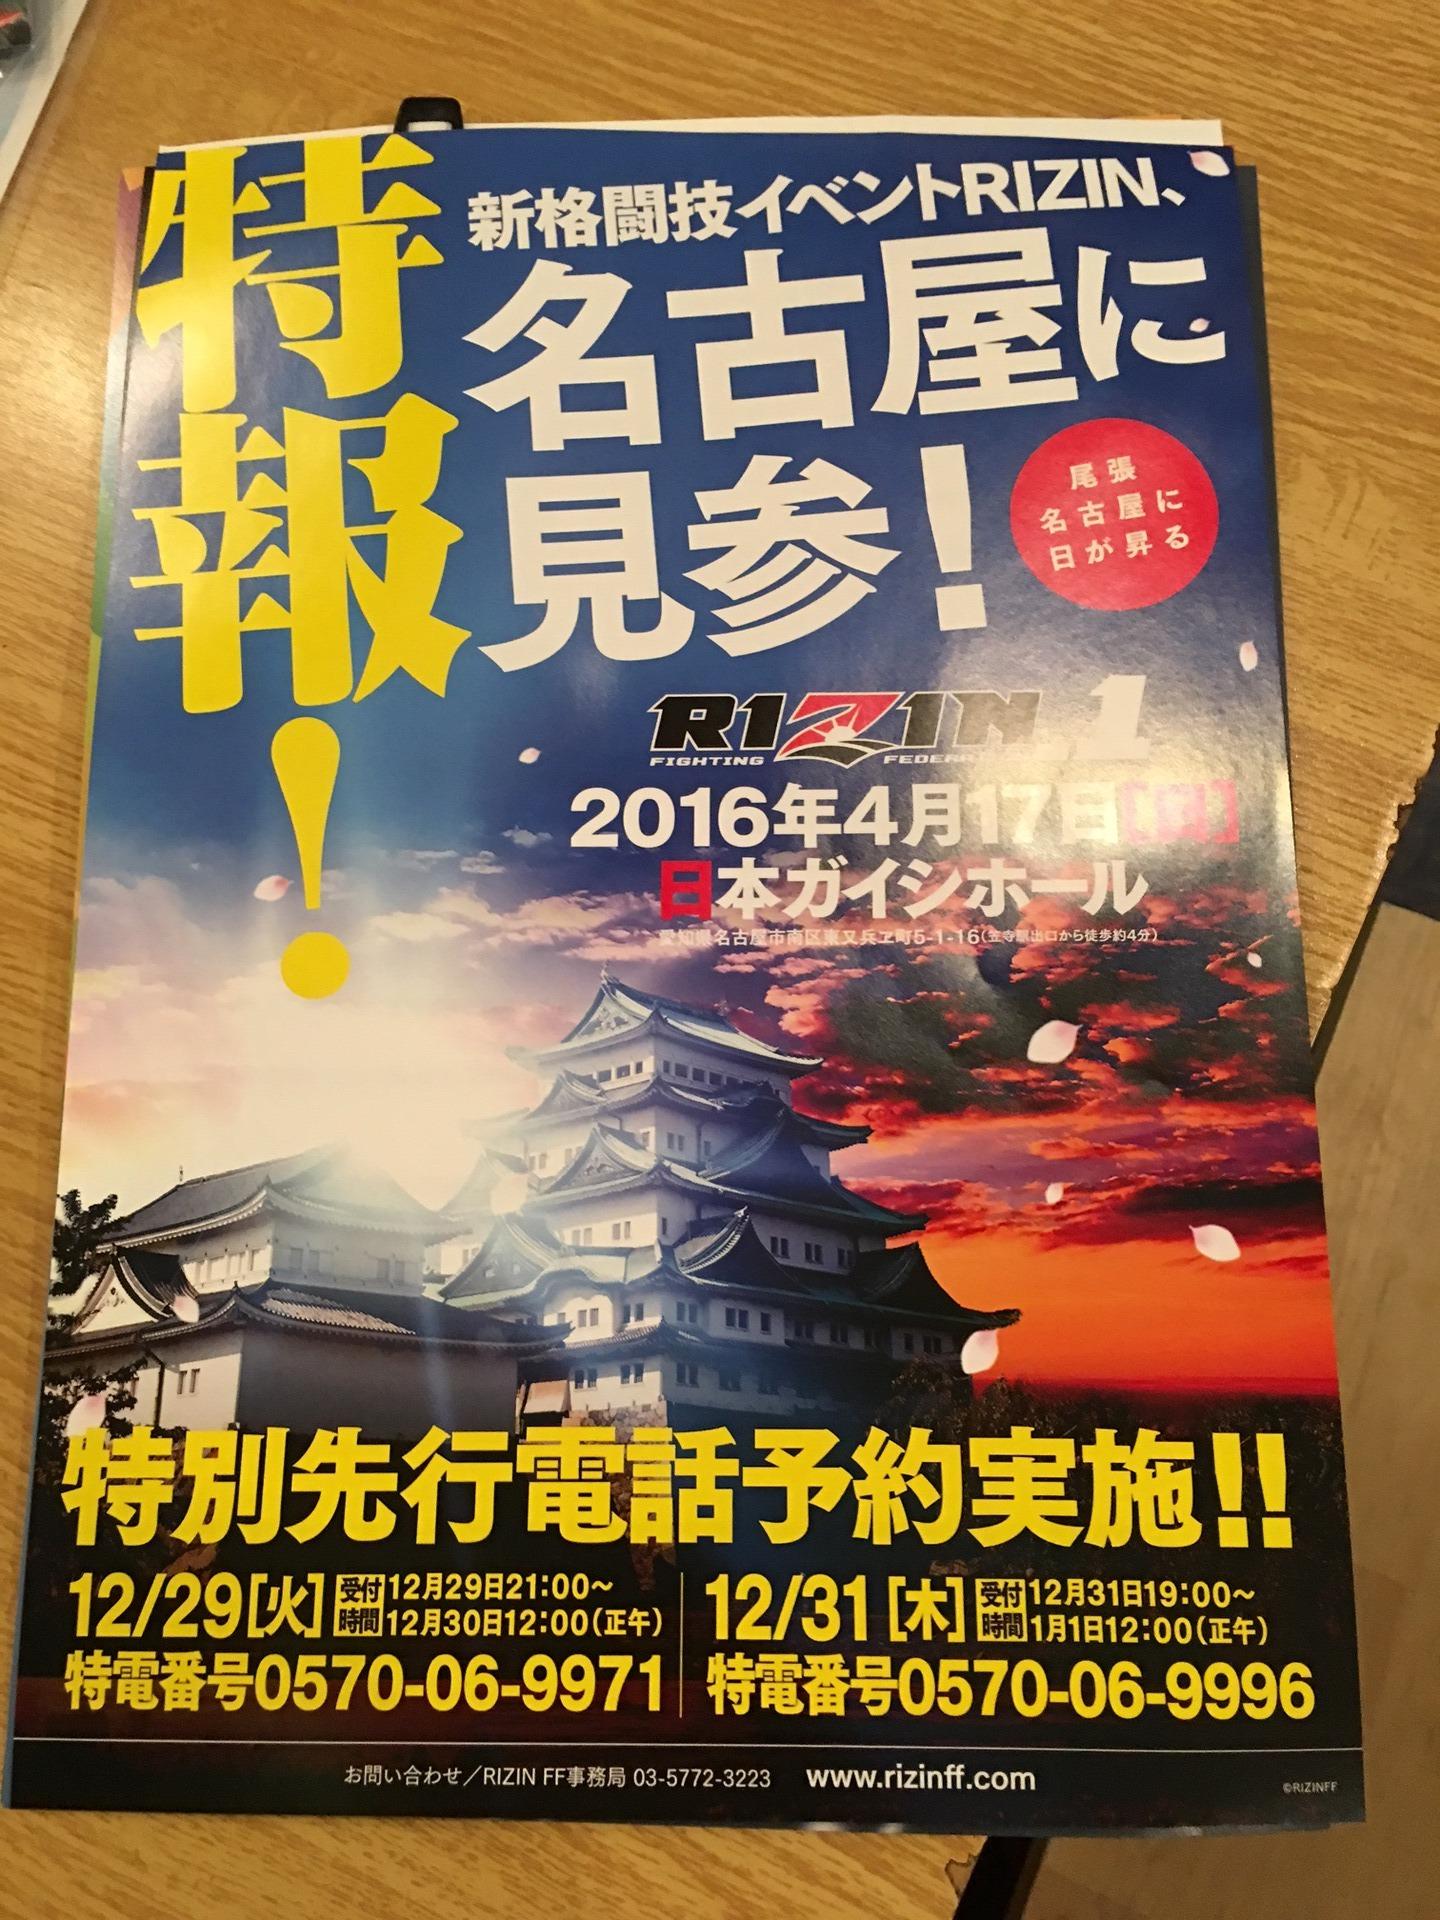 image/2015-12-29T213A203A56-1.JPG